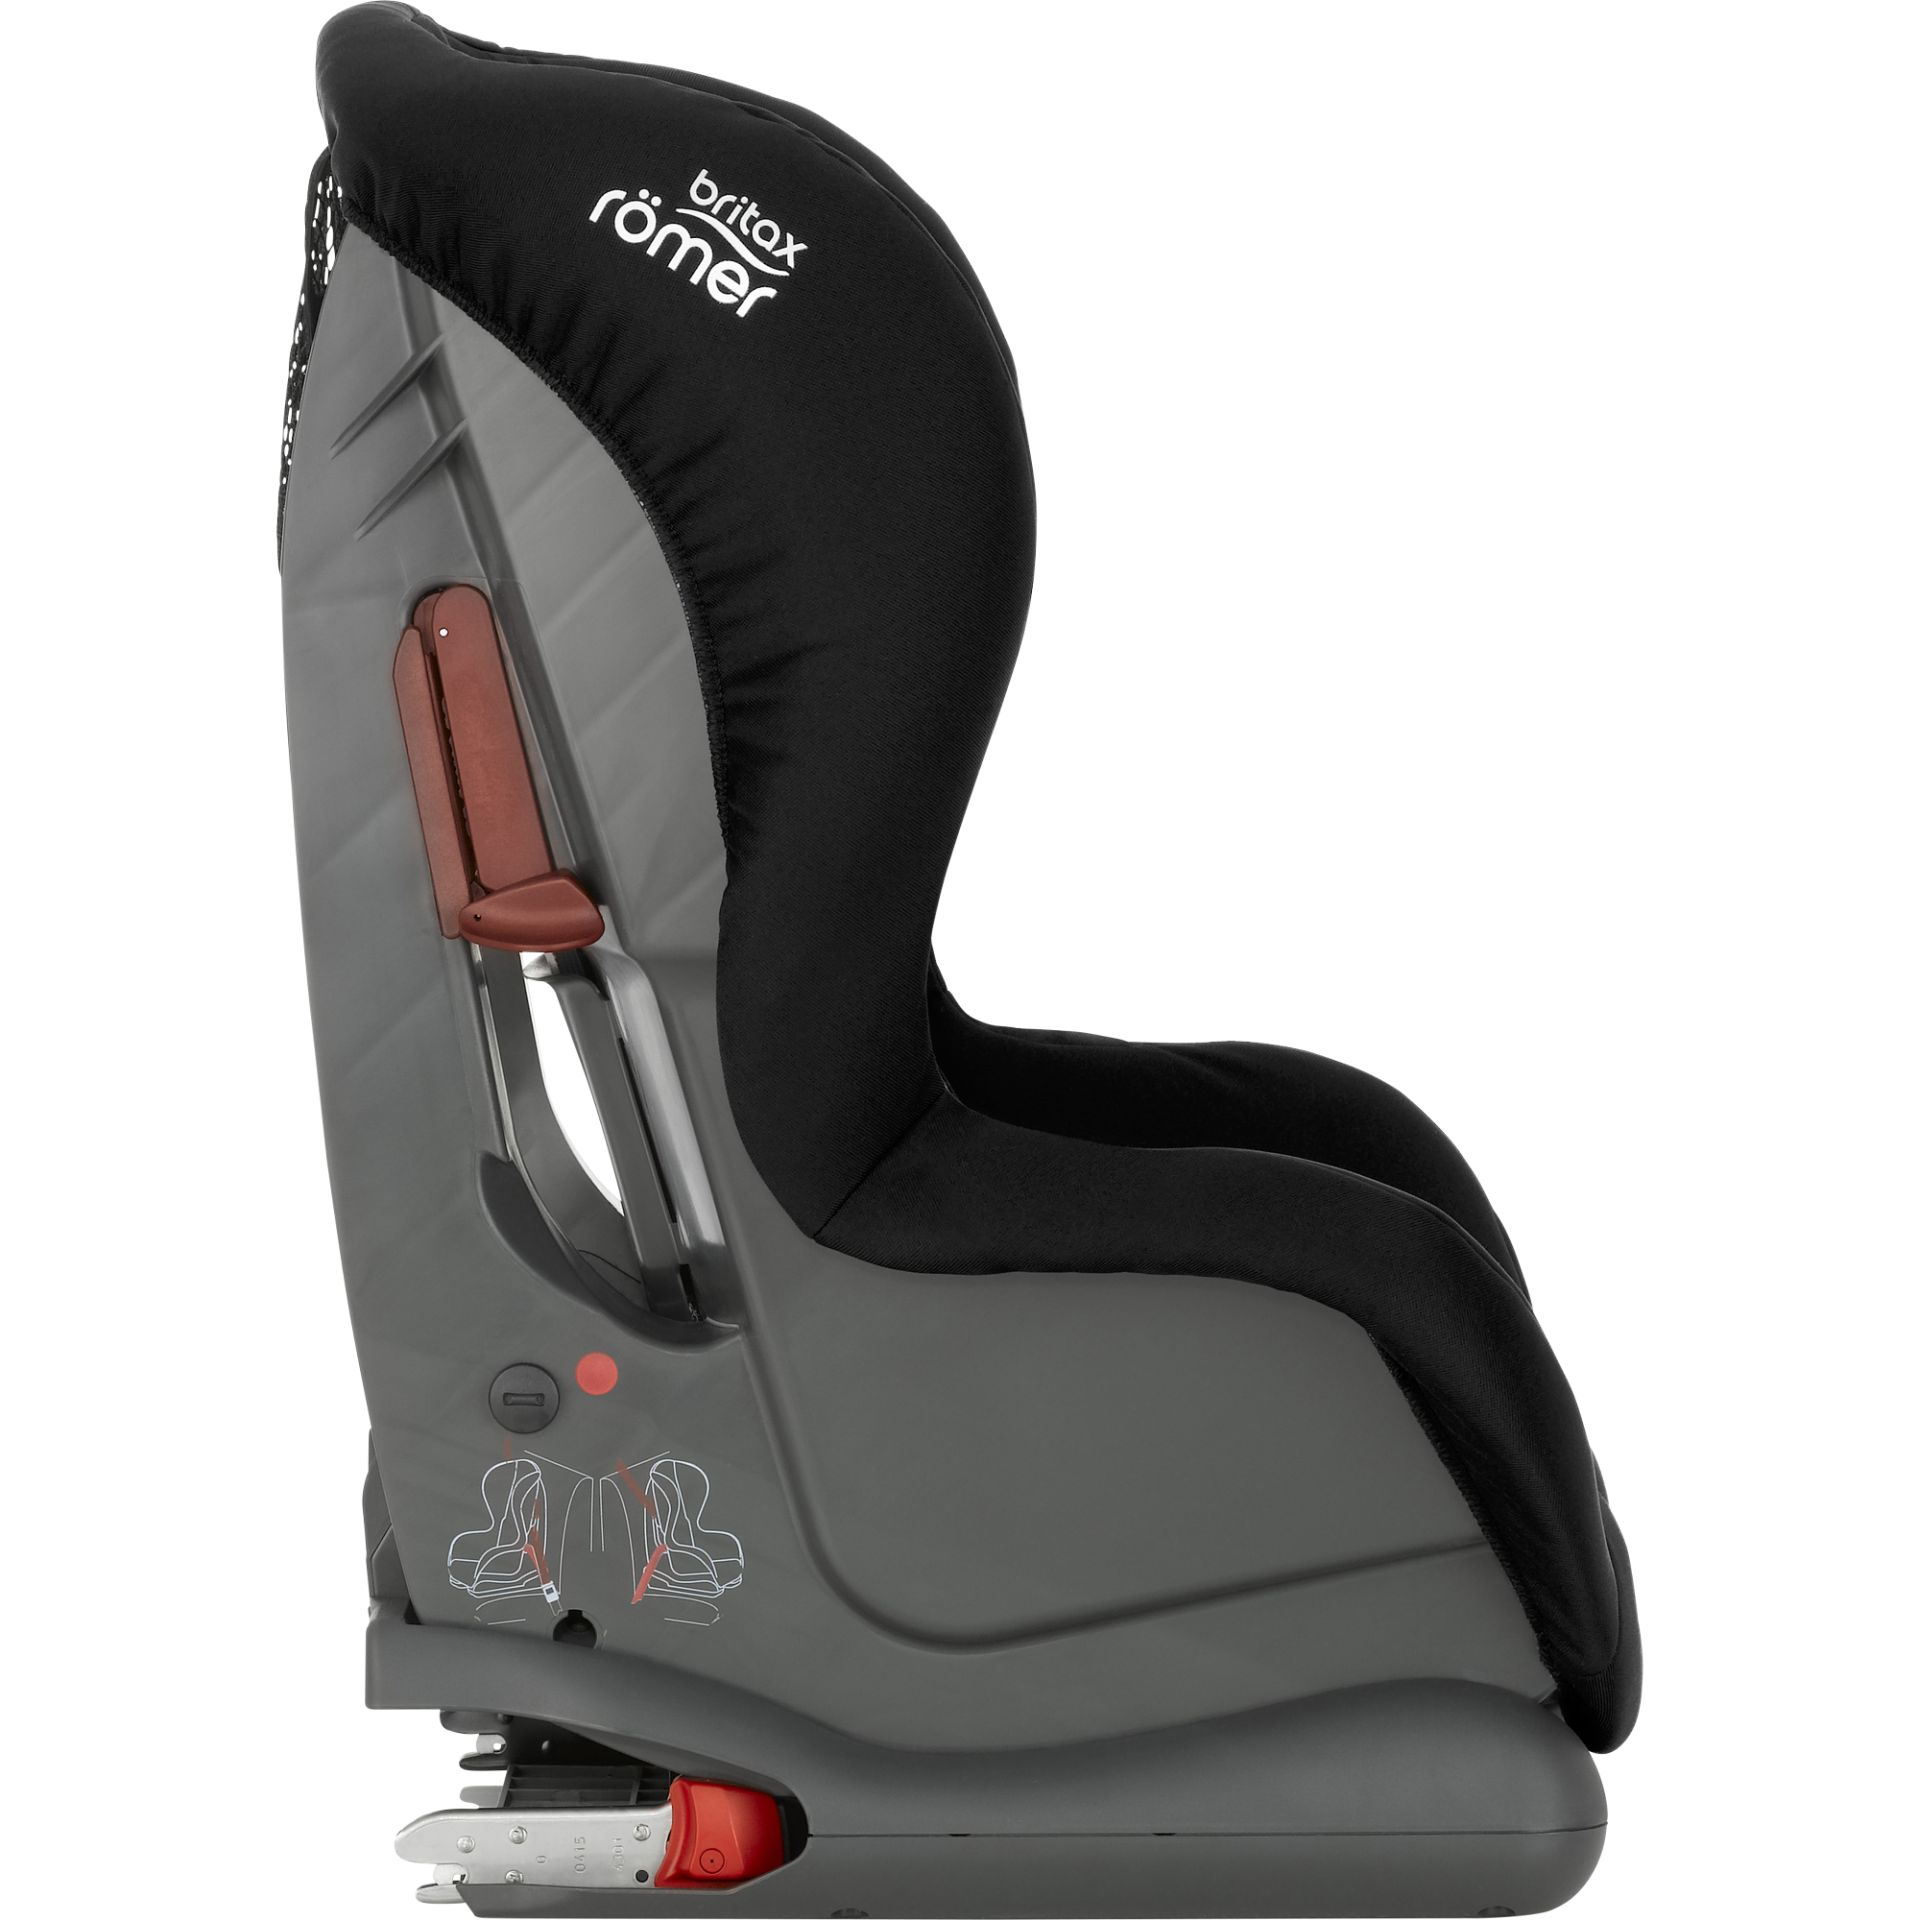 Britax Rmer Car Seat Duo Plus Cosmos Black 2019